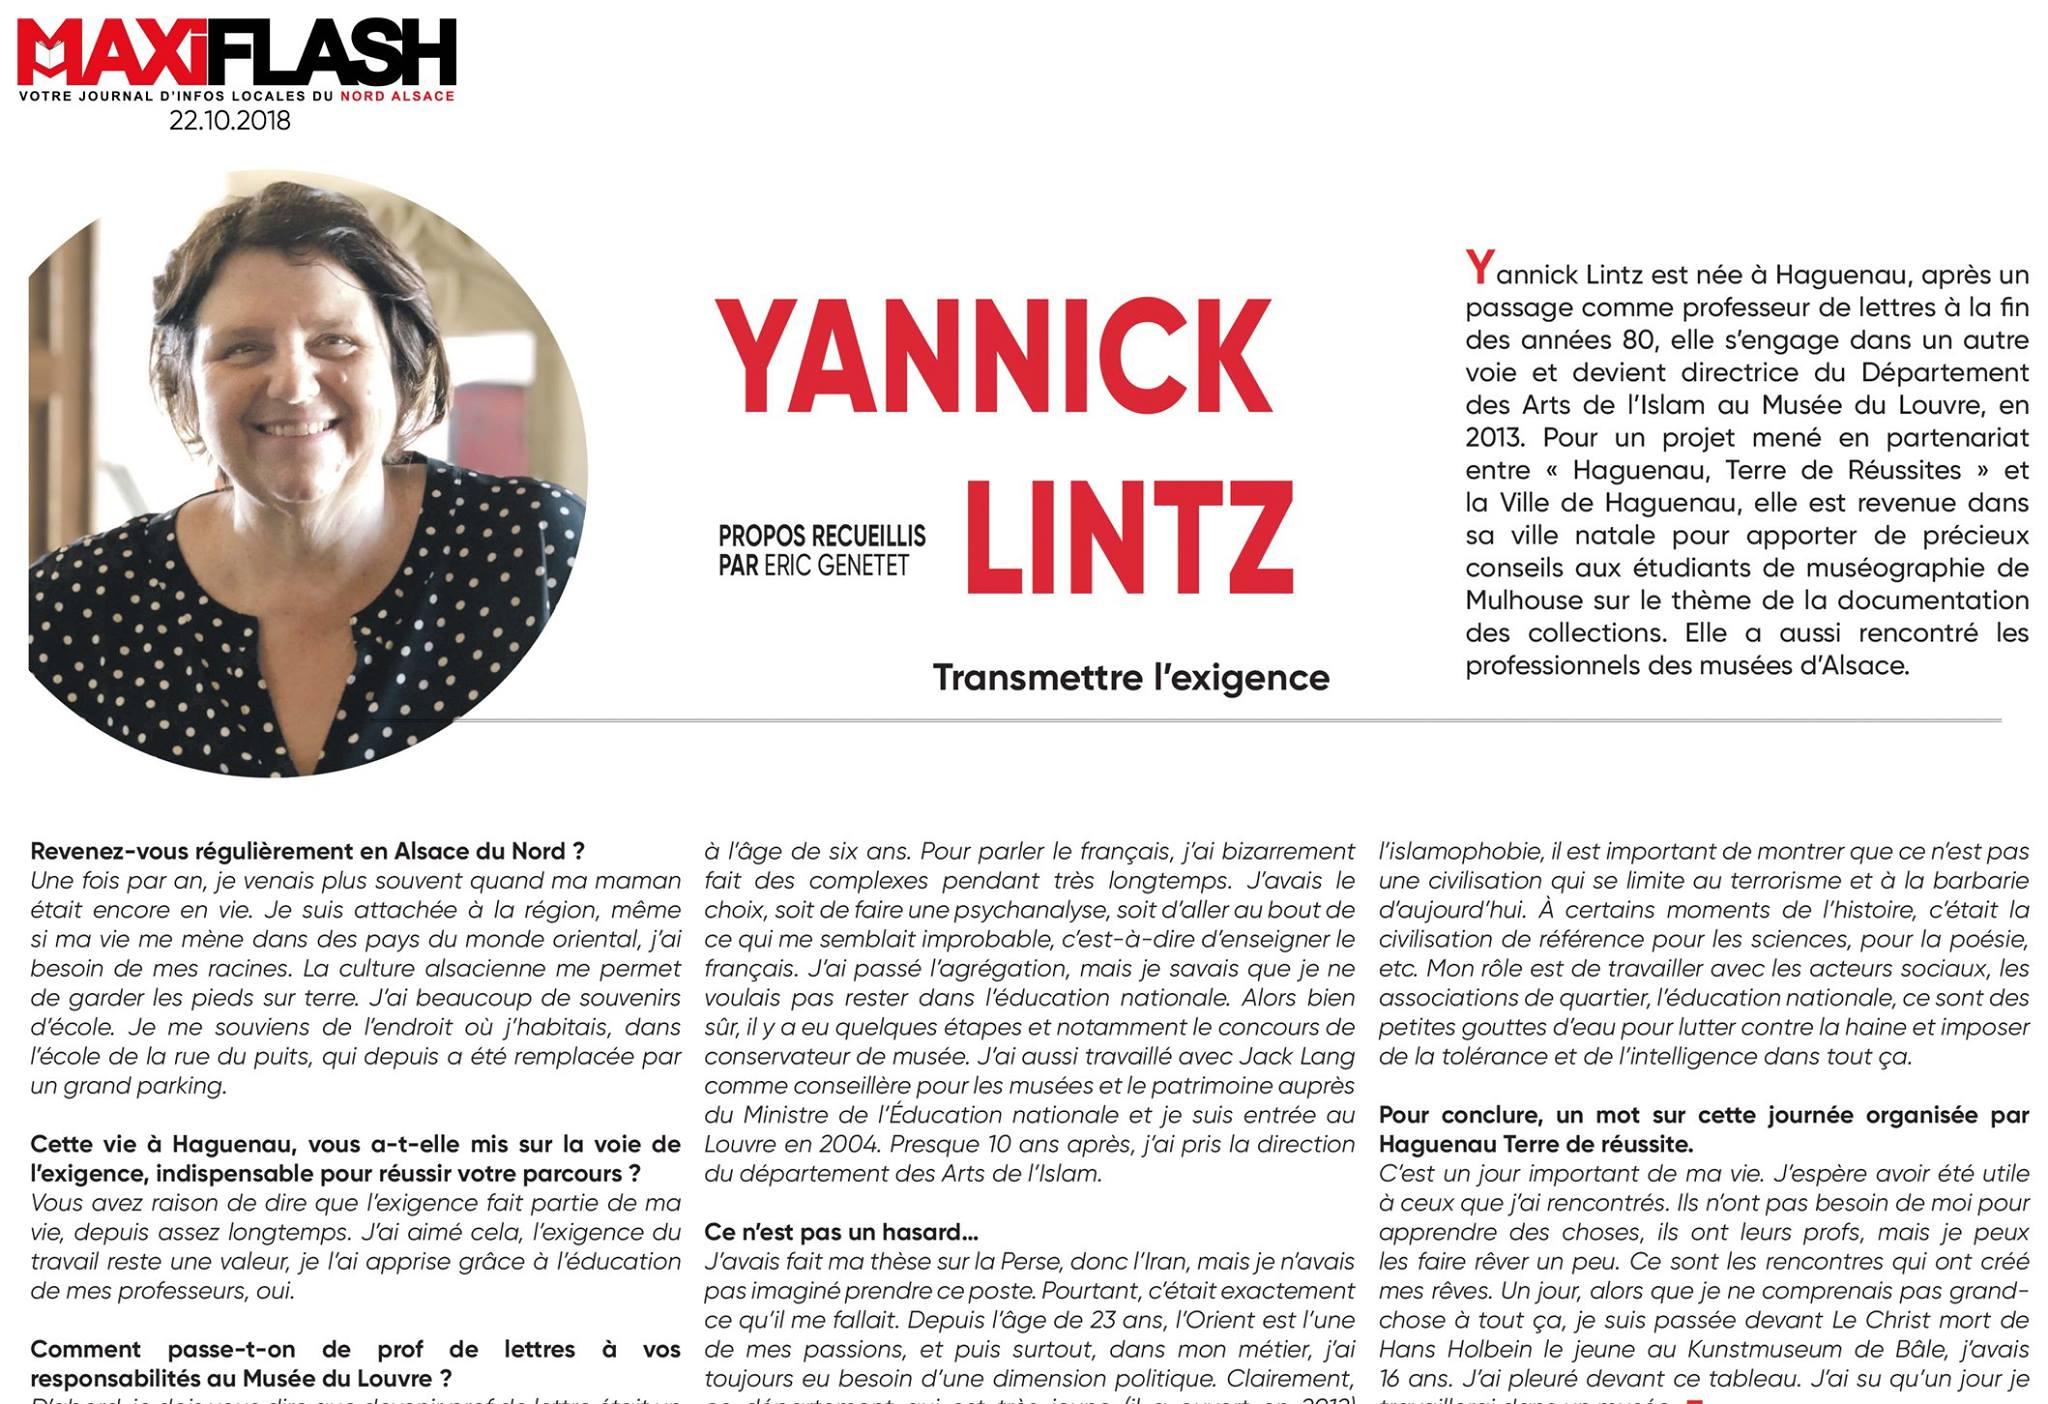 Yannick Lintz Transmettre l'exigence - Presse